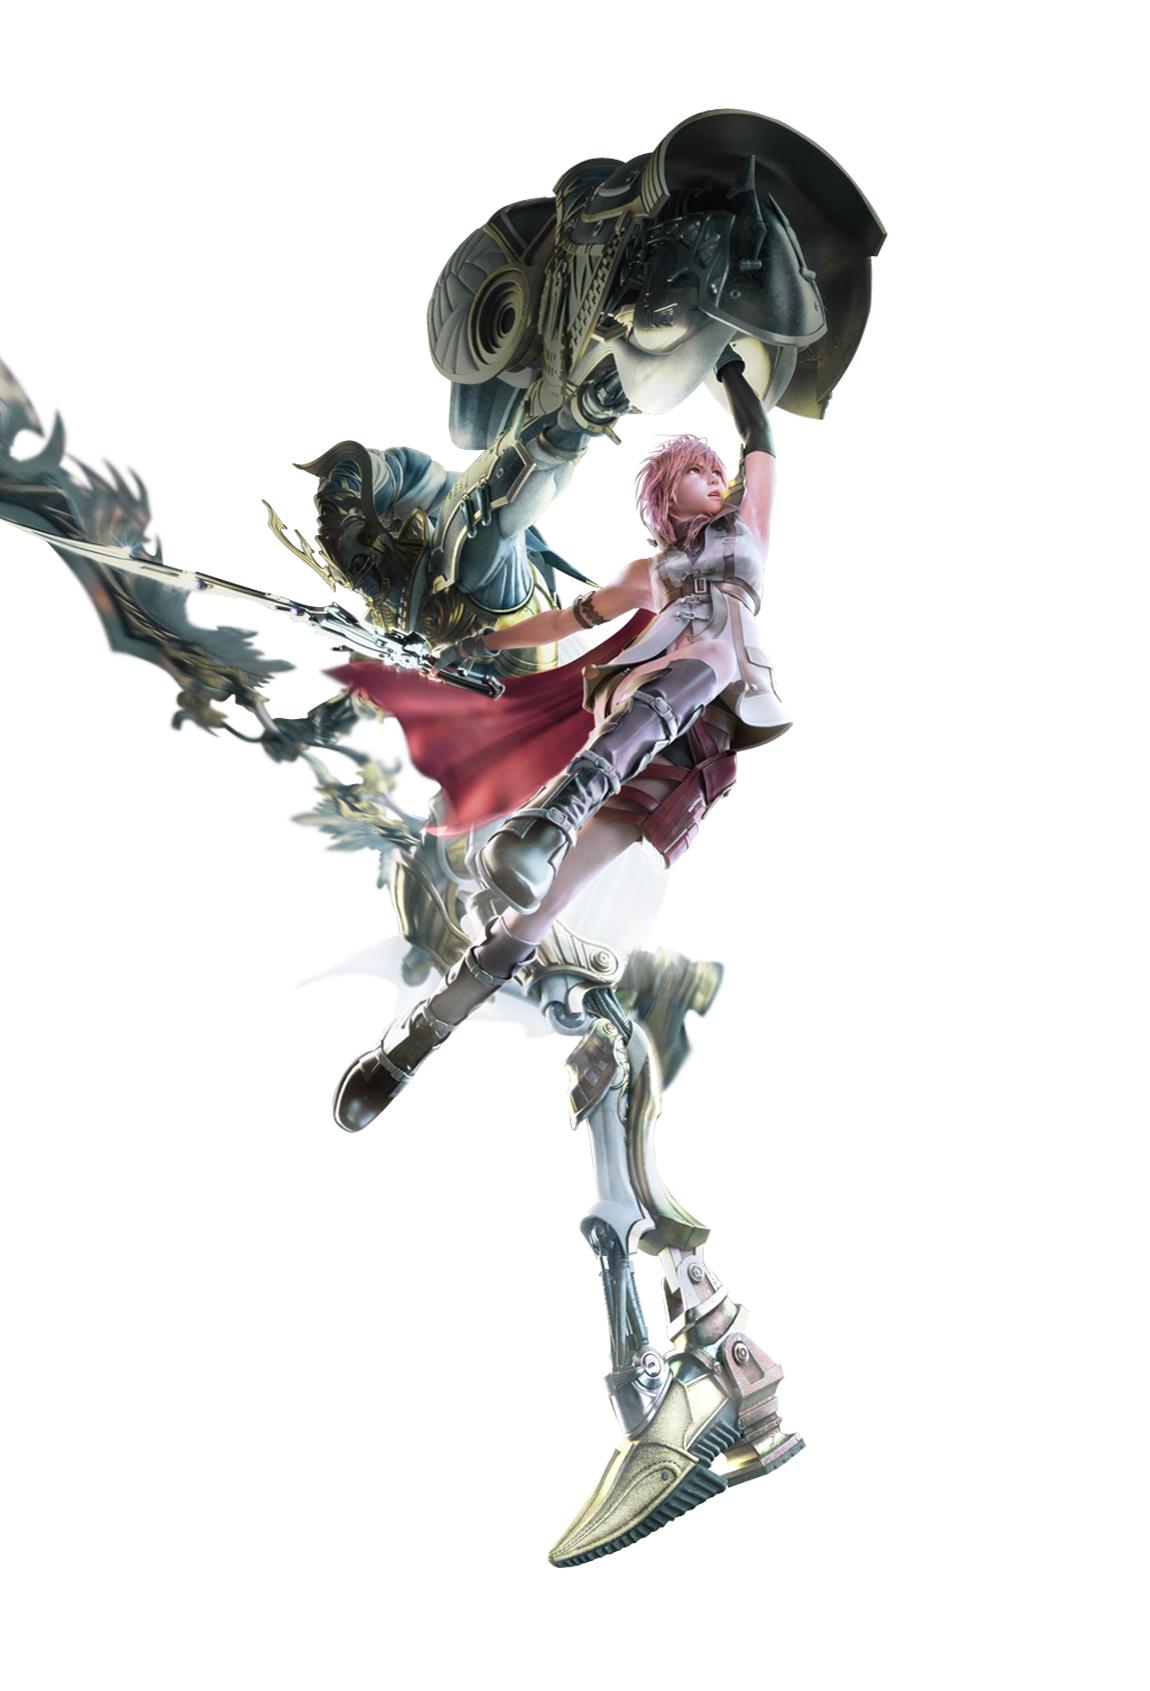 Final Fantasy Xiii Characters Final Fantasy XIII: Fi...